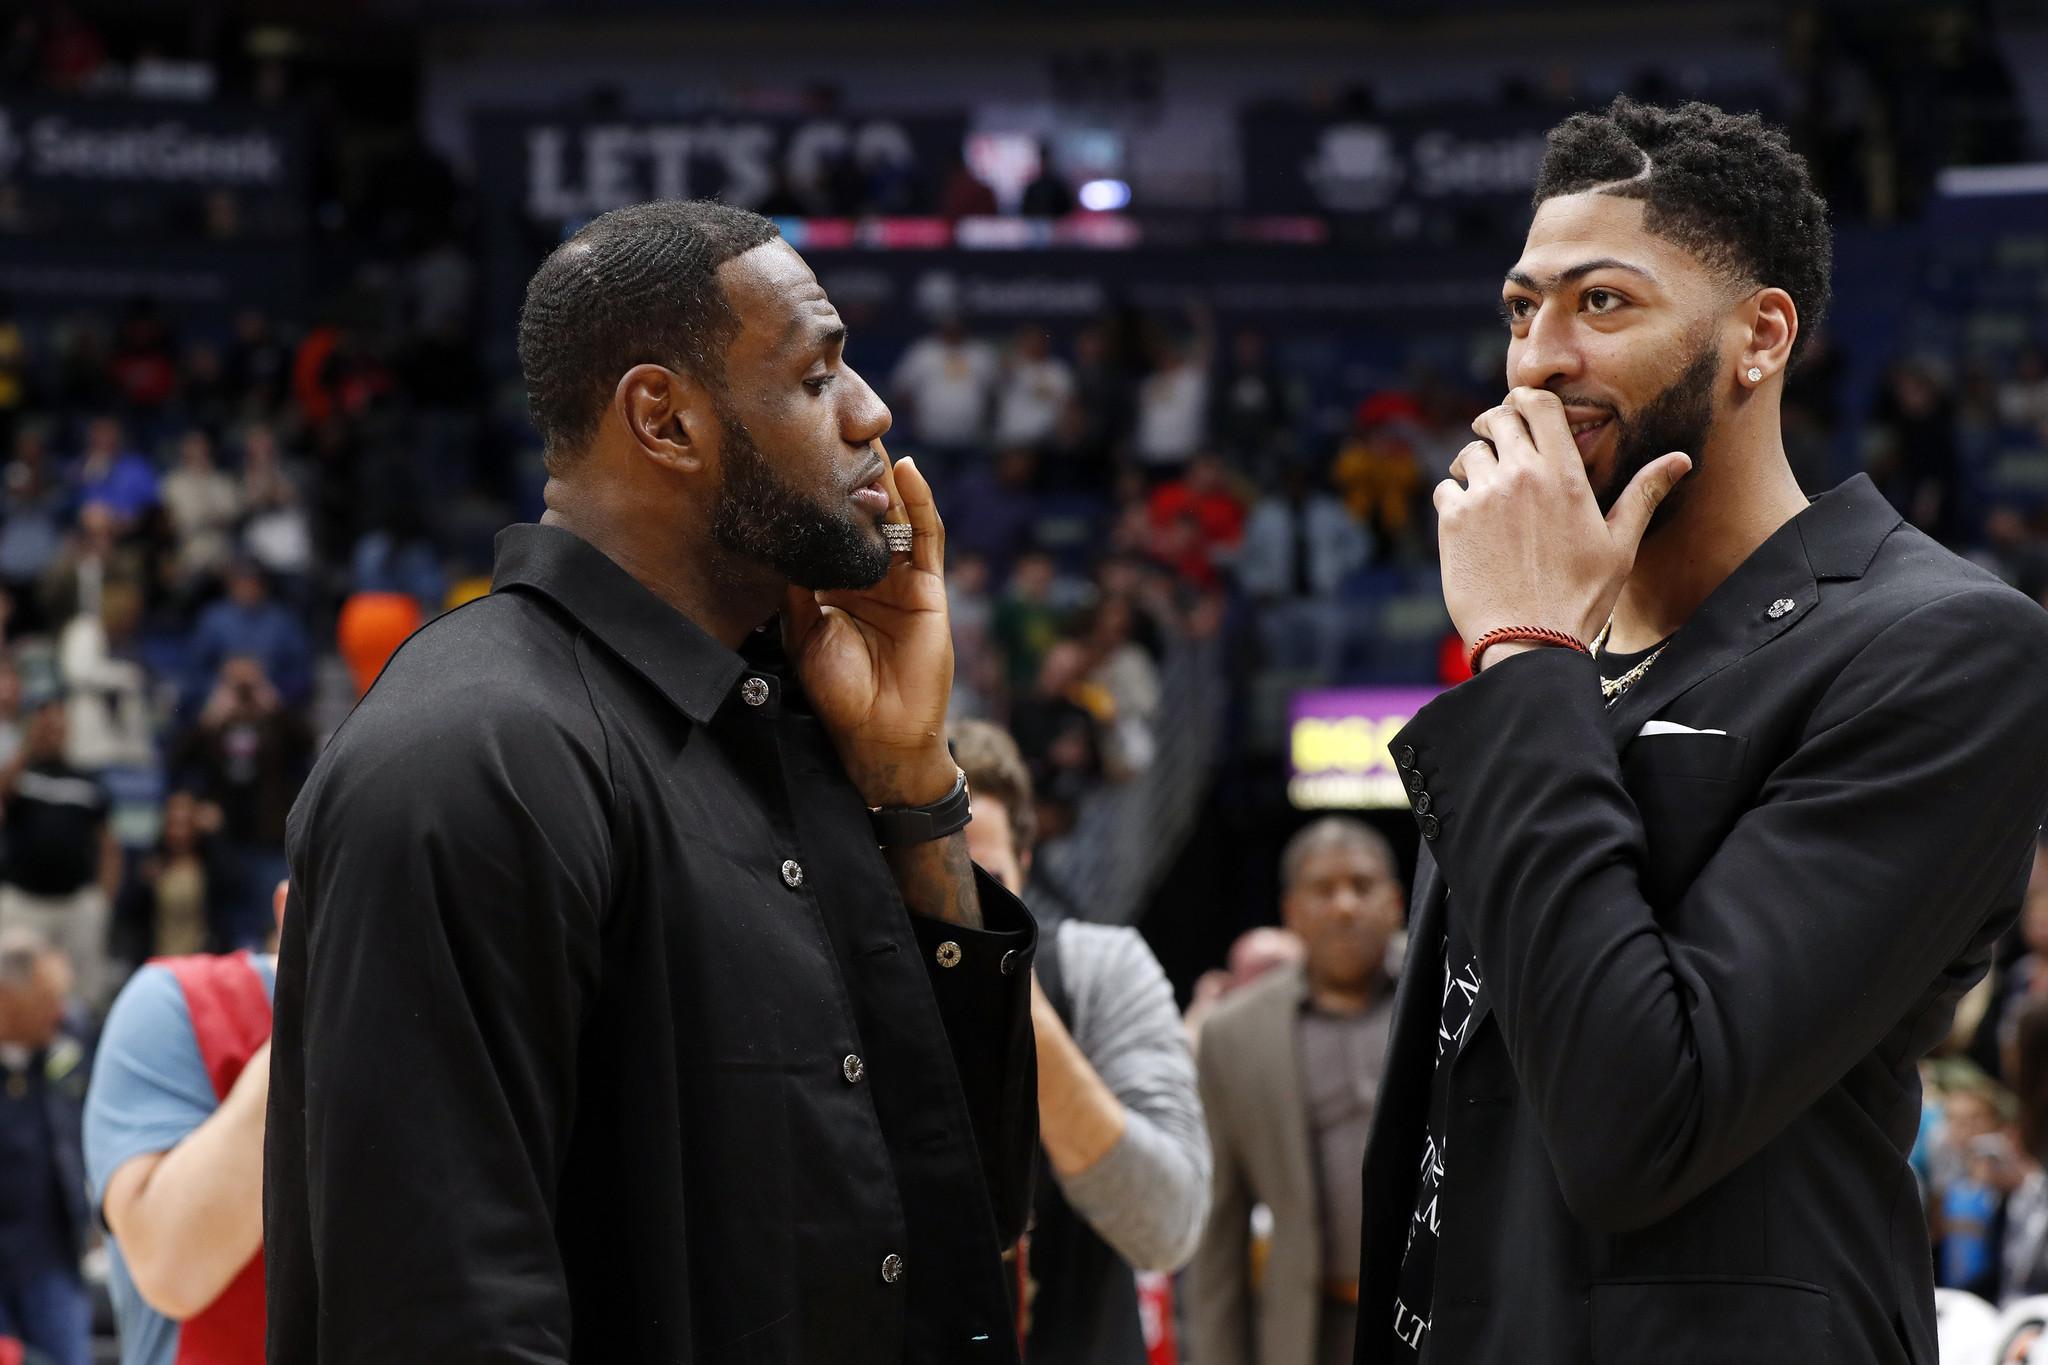 Anthony Davis trade gives Lakers championship hopes